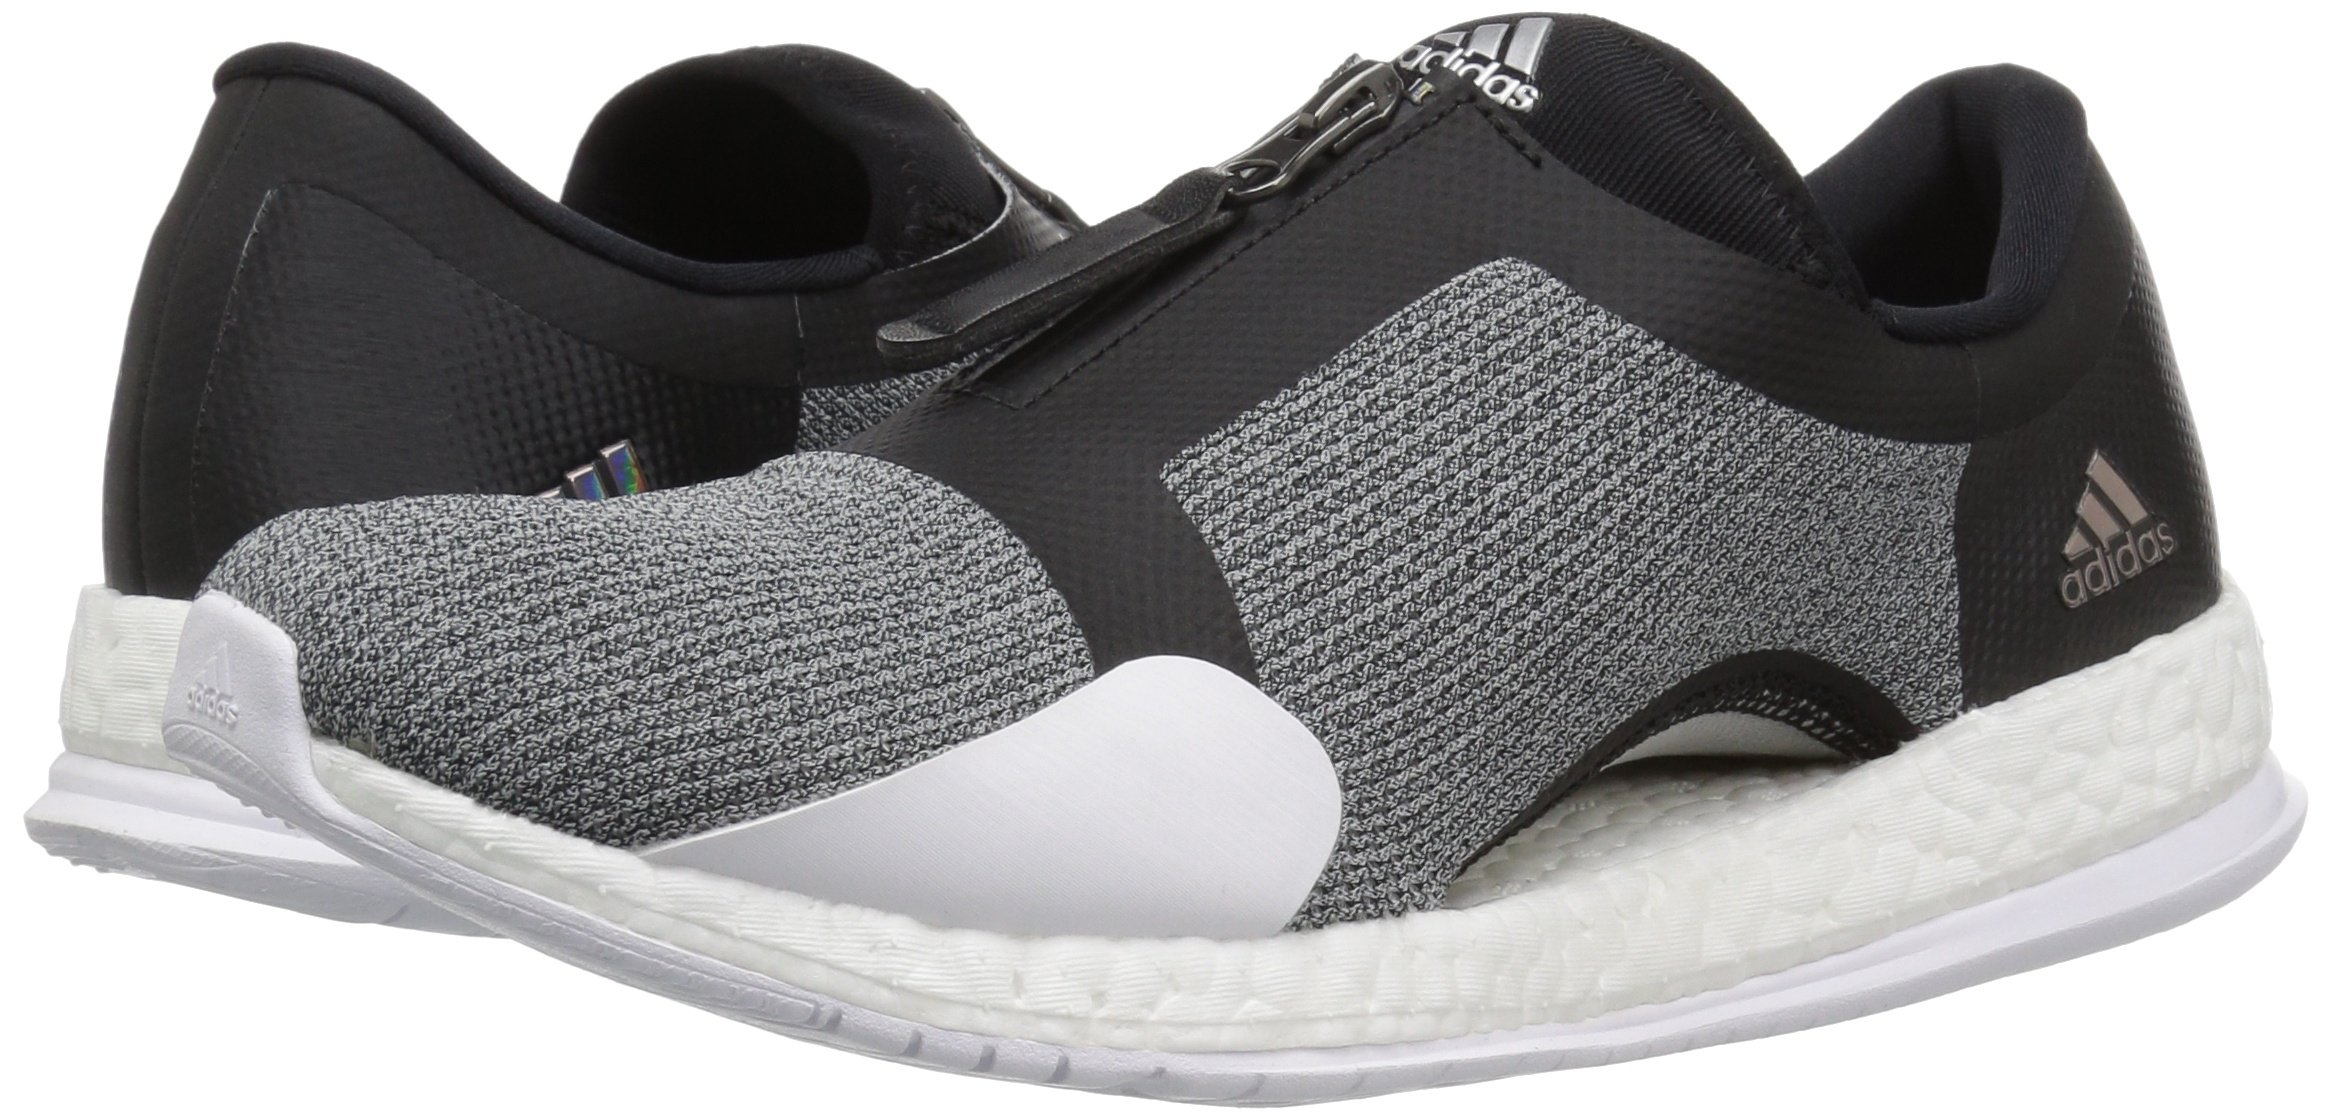 81I79mV1IFL - adidas Womens Pure Boost x tr Zip Low Top Slip On Fashion Sneakers